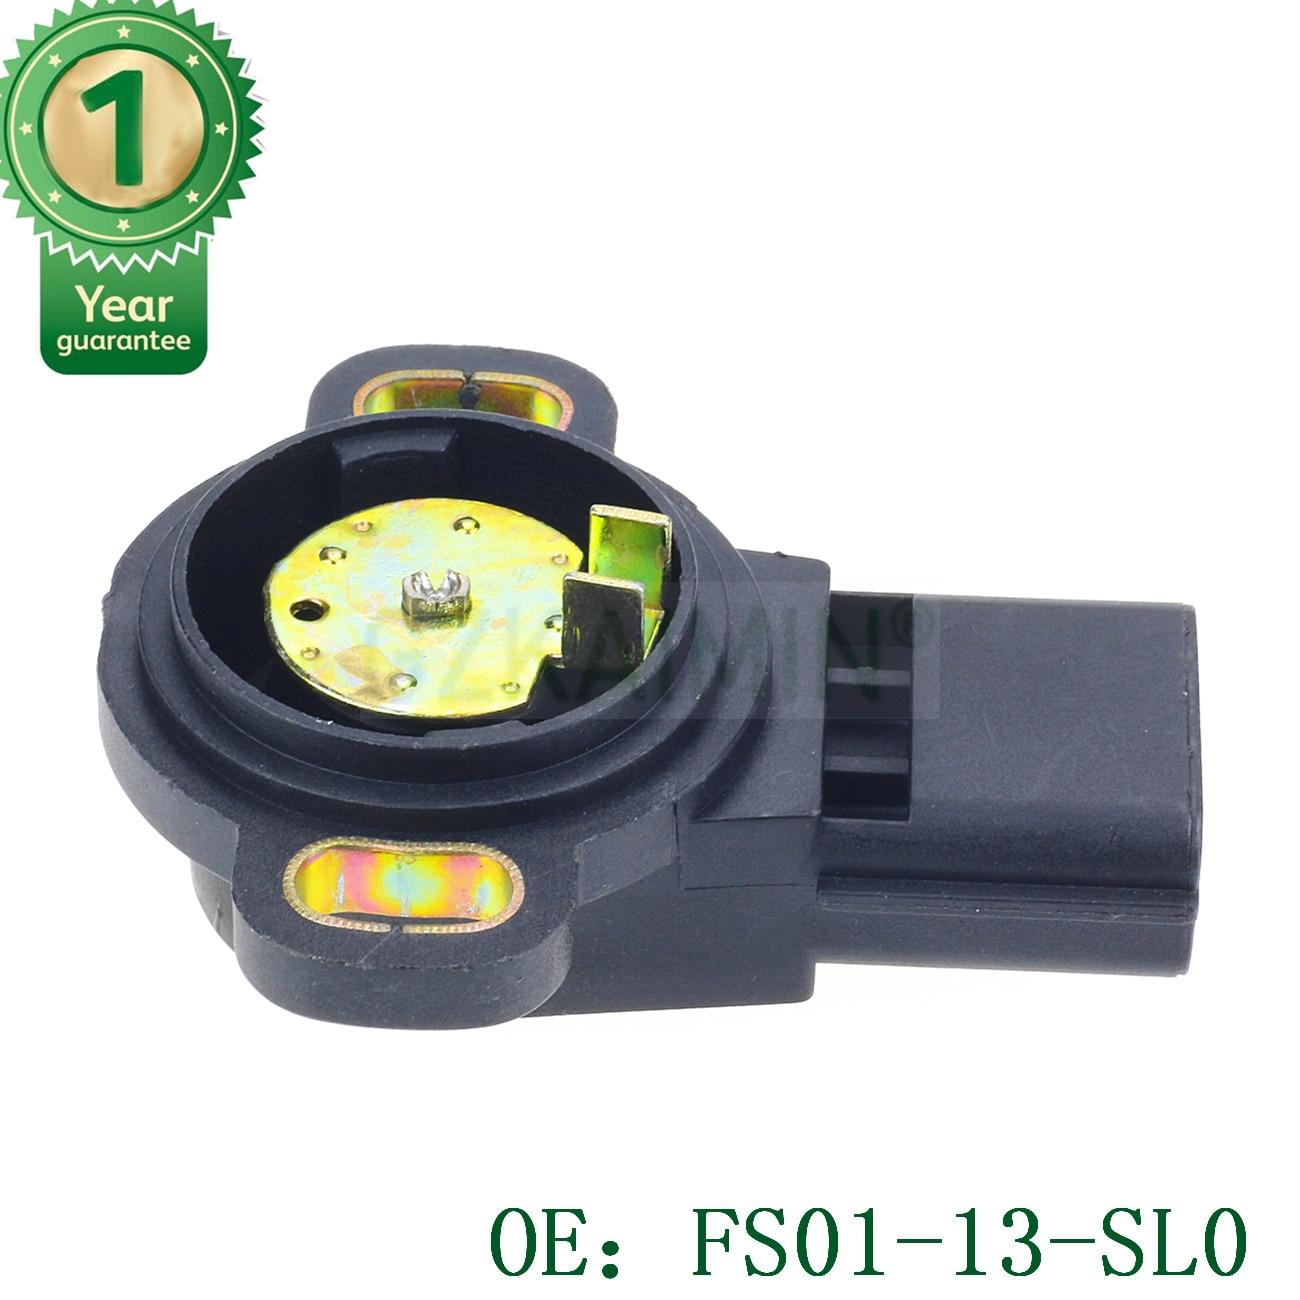 Neue neue gute qualität eine tps Drossel Position Sensor TPS SENSOR oem FS01-13-SL0 FS0113SL0 für MAZDA 626 MX6 PROTEGE